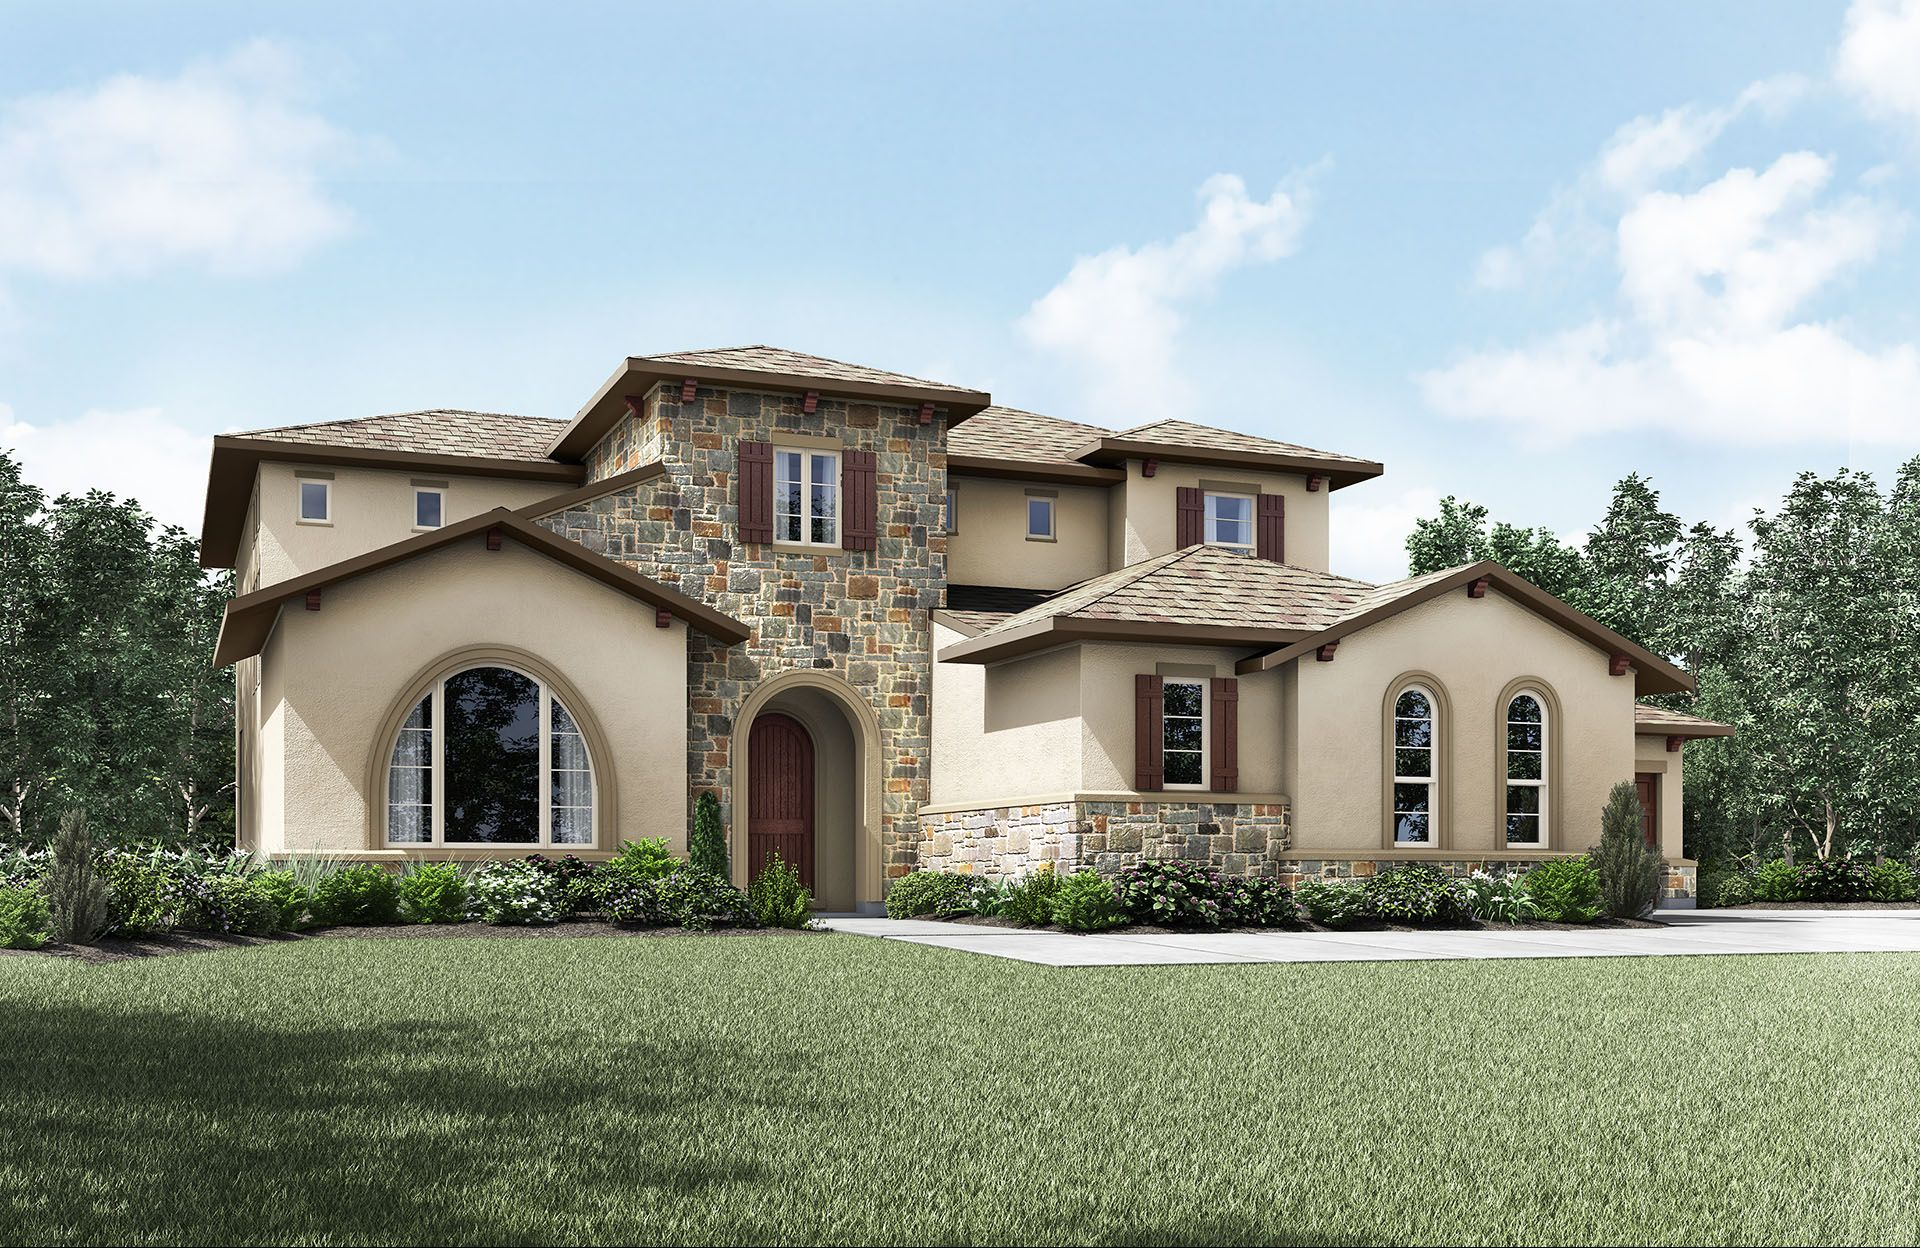 Single Family for Sale at Cimarron Hills - Lynmar 307 Flint Ridge Trail Georgetown, Texas 78628 United States